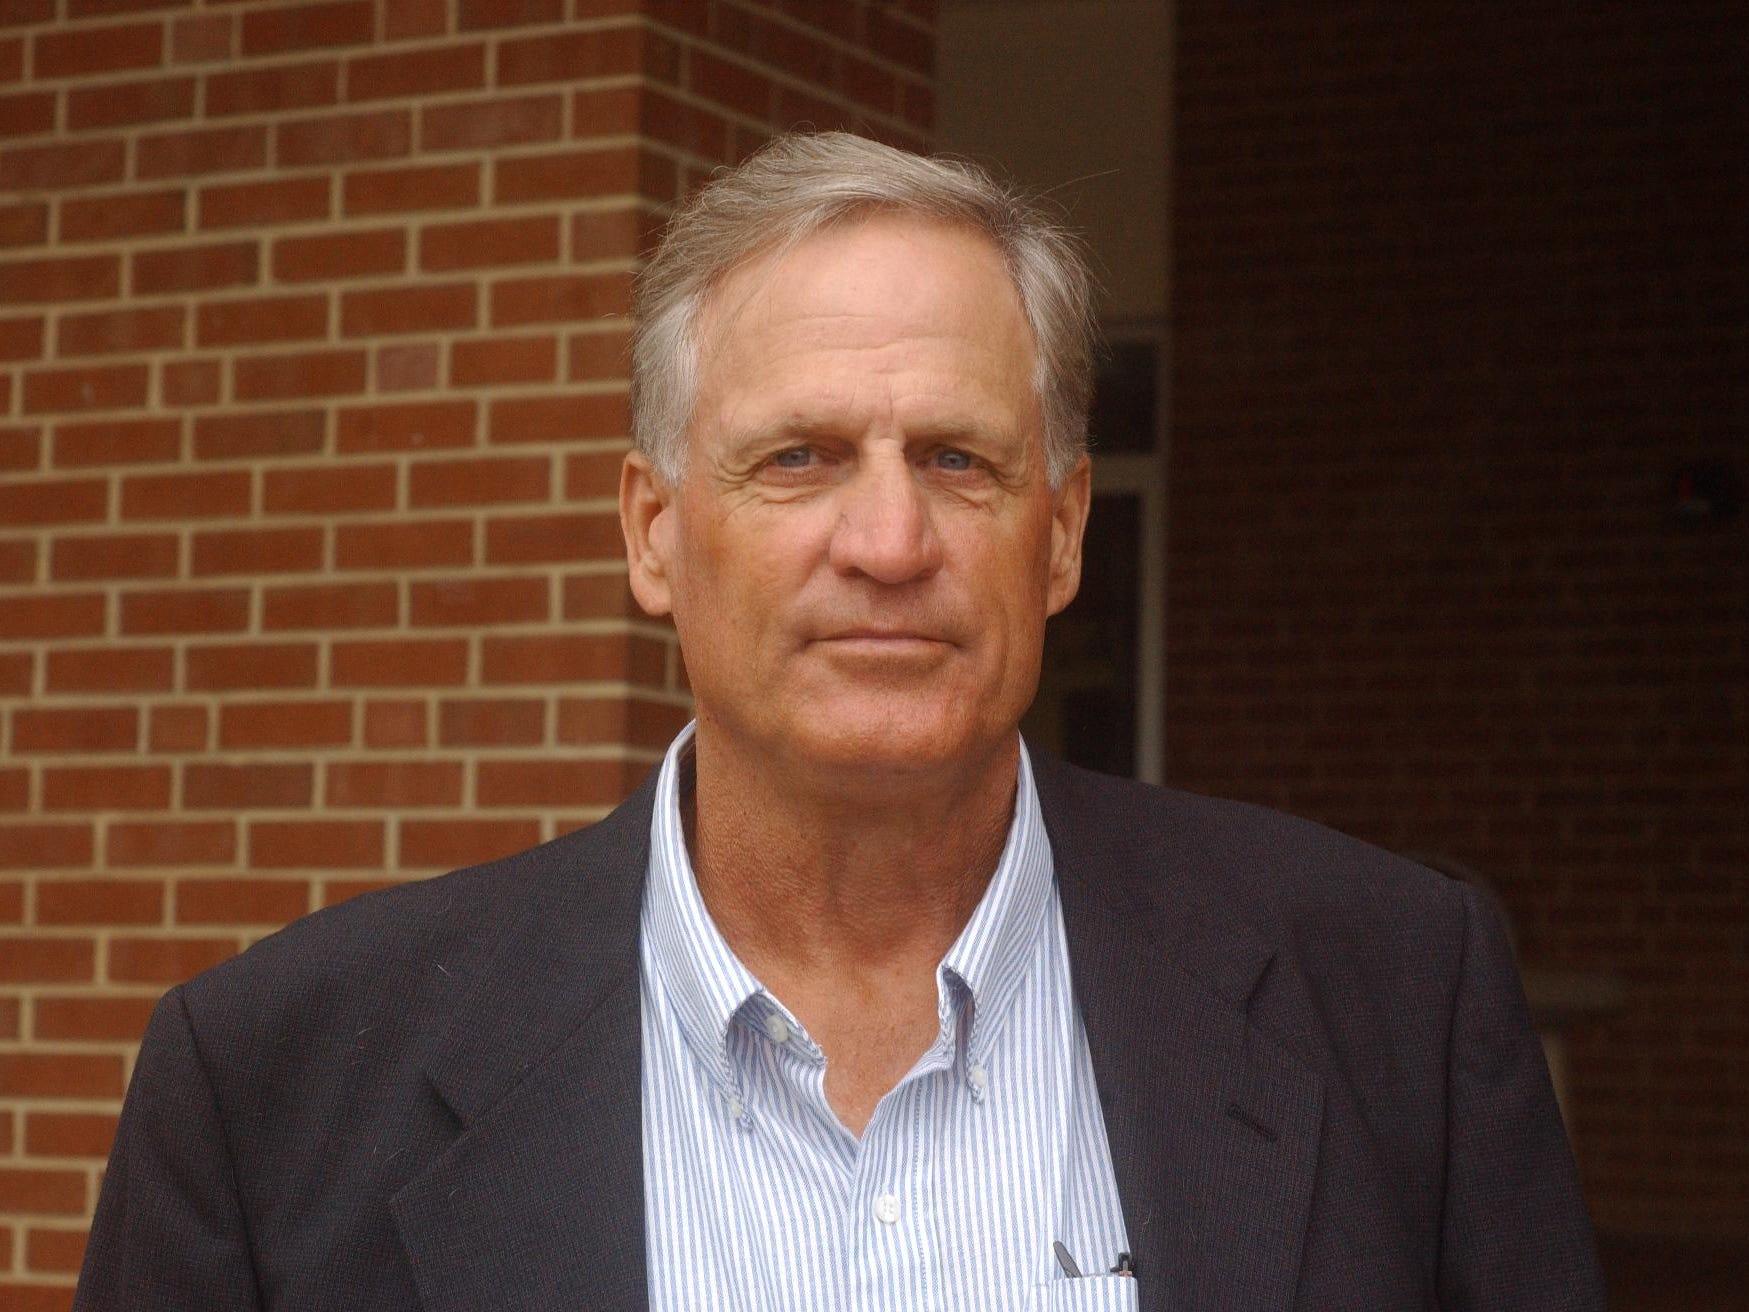 Dennis Dull